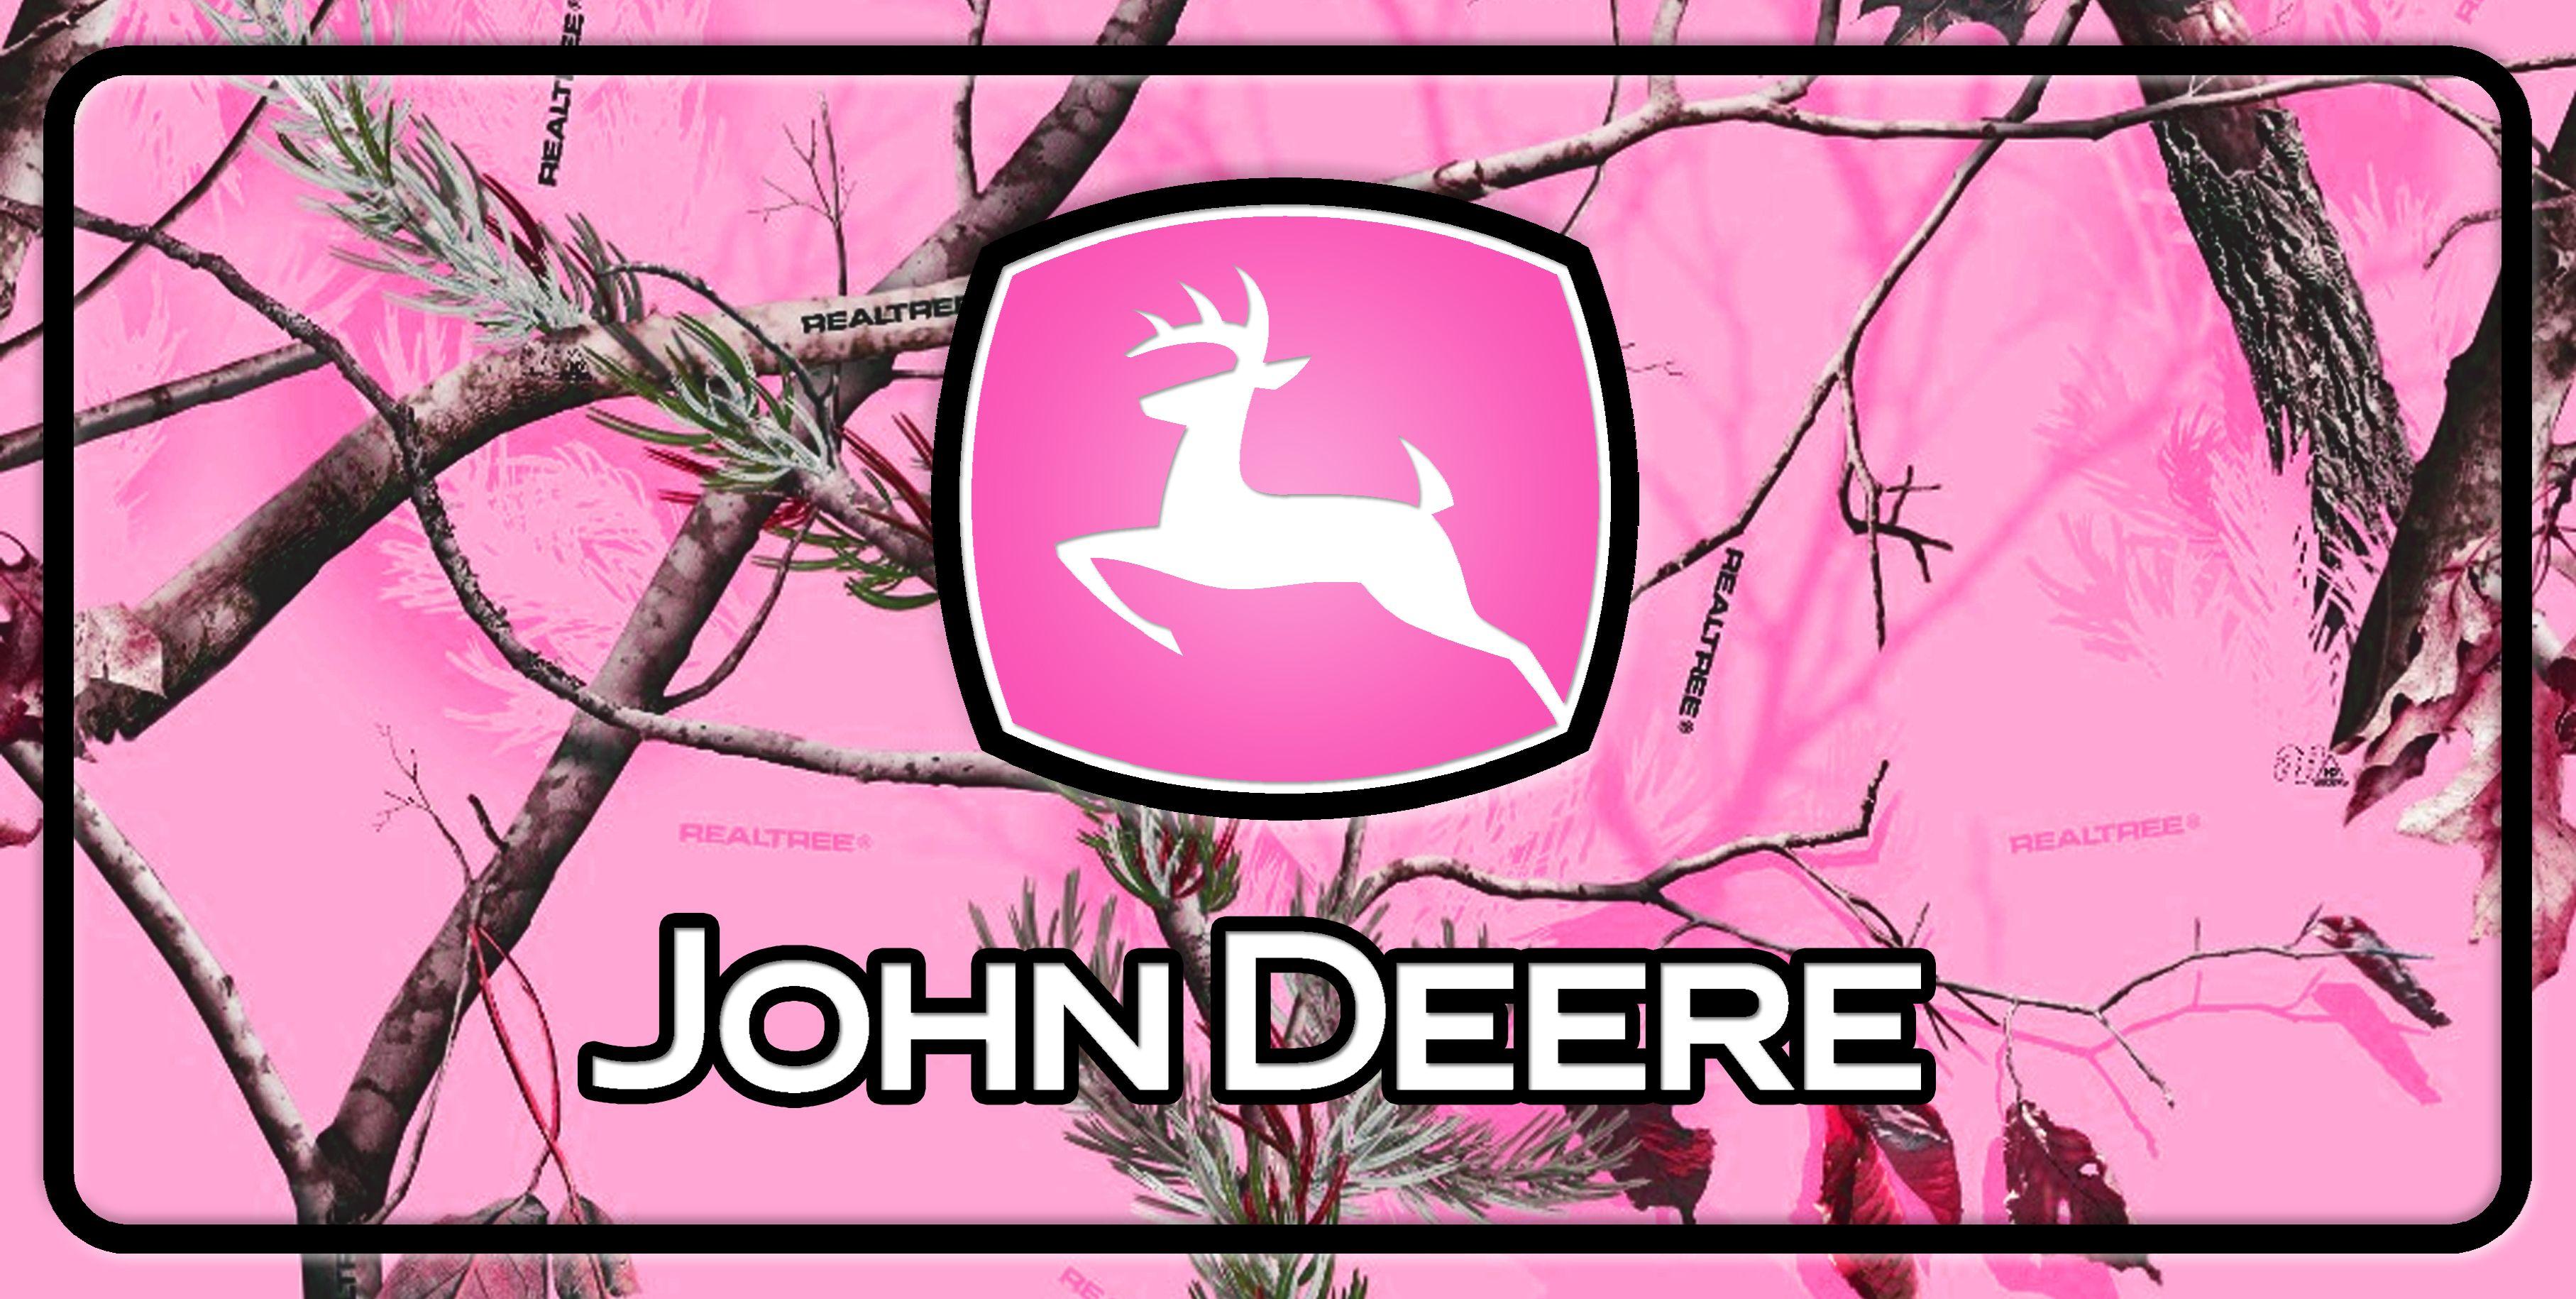 Custom Sales Receipts Word Camo Pink John Deere  John Deere Wallpaper  Pinterest Freelance Invoice Template Excel Word with Invoicing Software  Invoice 2go